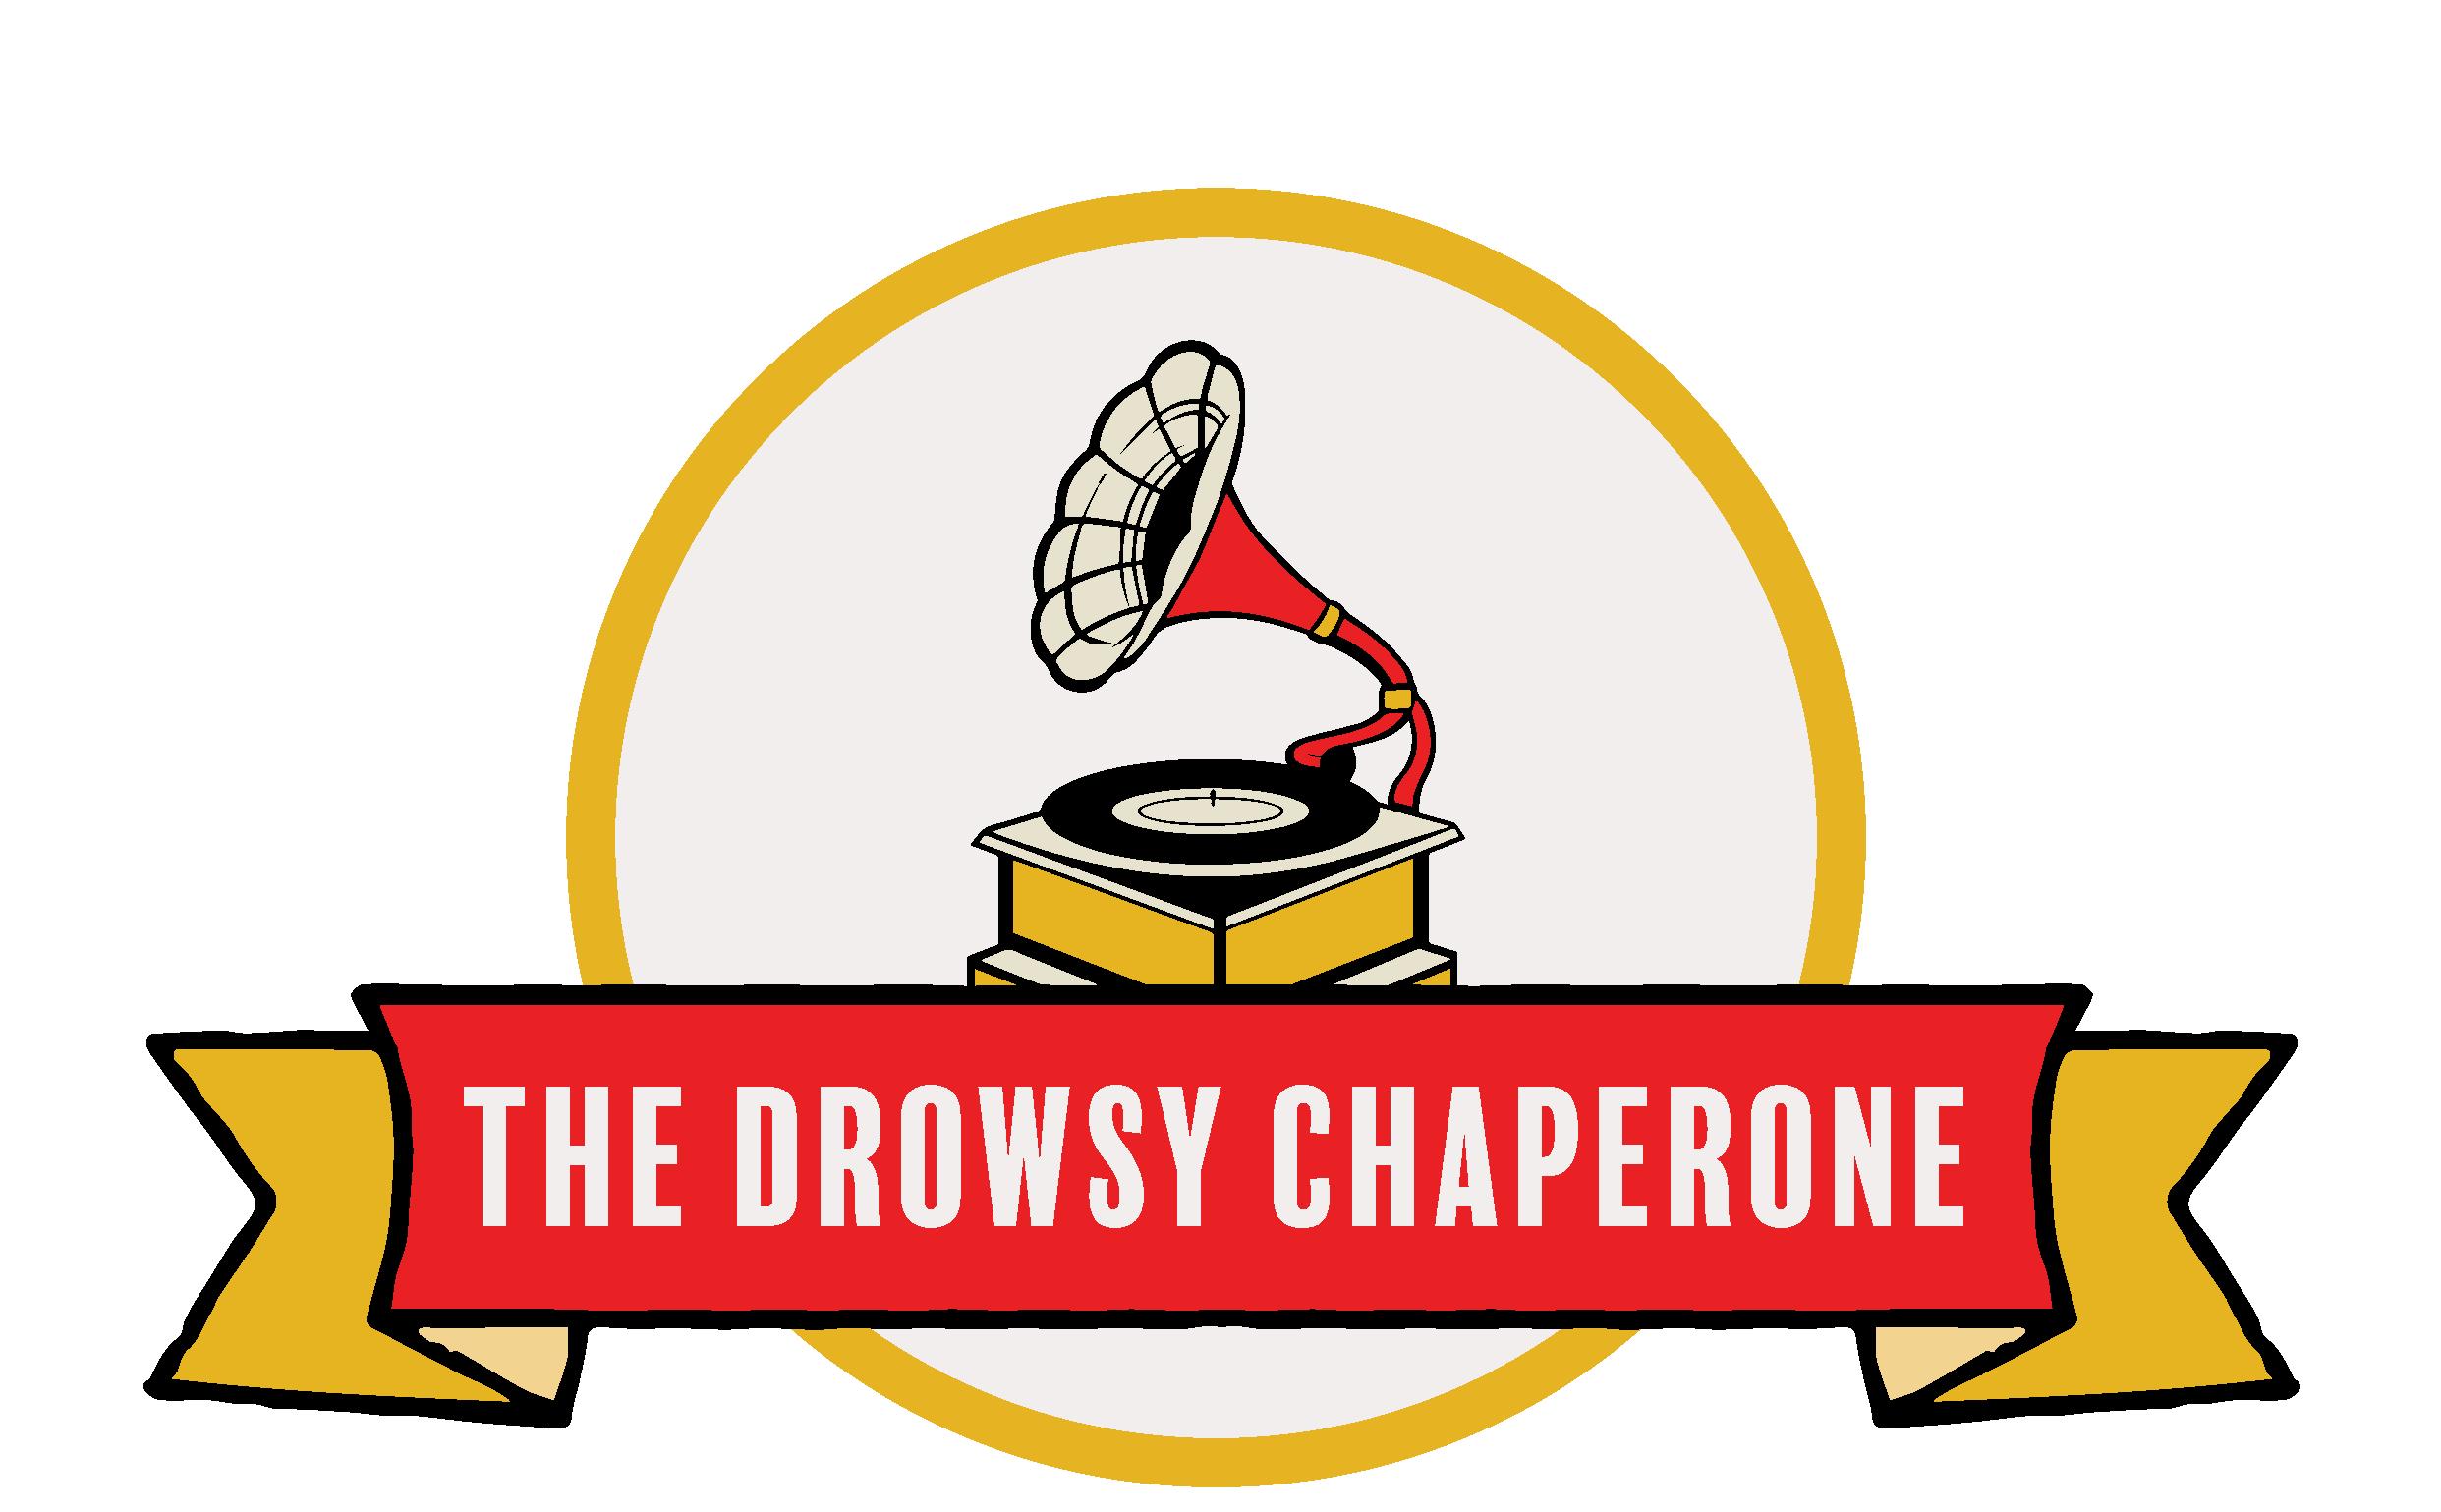 The Drowsy Chaperone logo